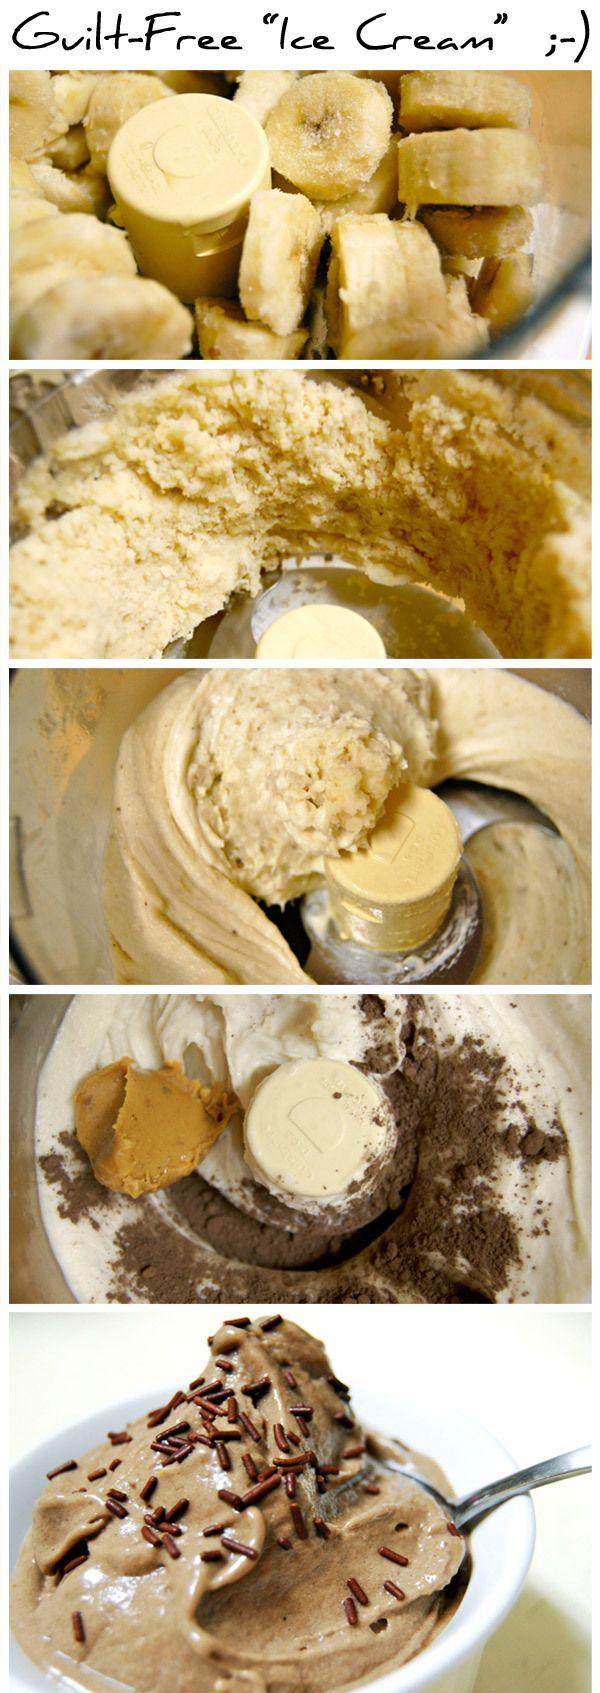 "Banana ""Ice Cream"" 4 frozen bananas 2 T Peanut butter 2 t cocoa (that's all!)"